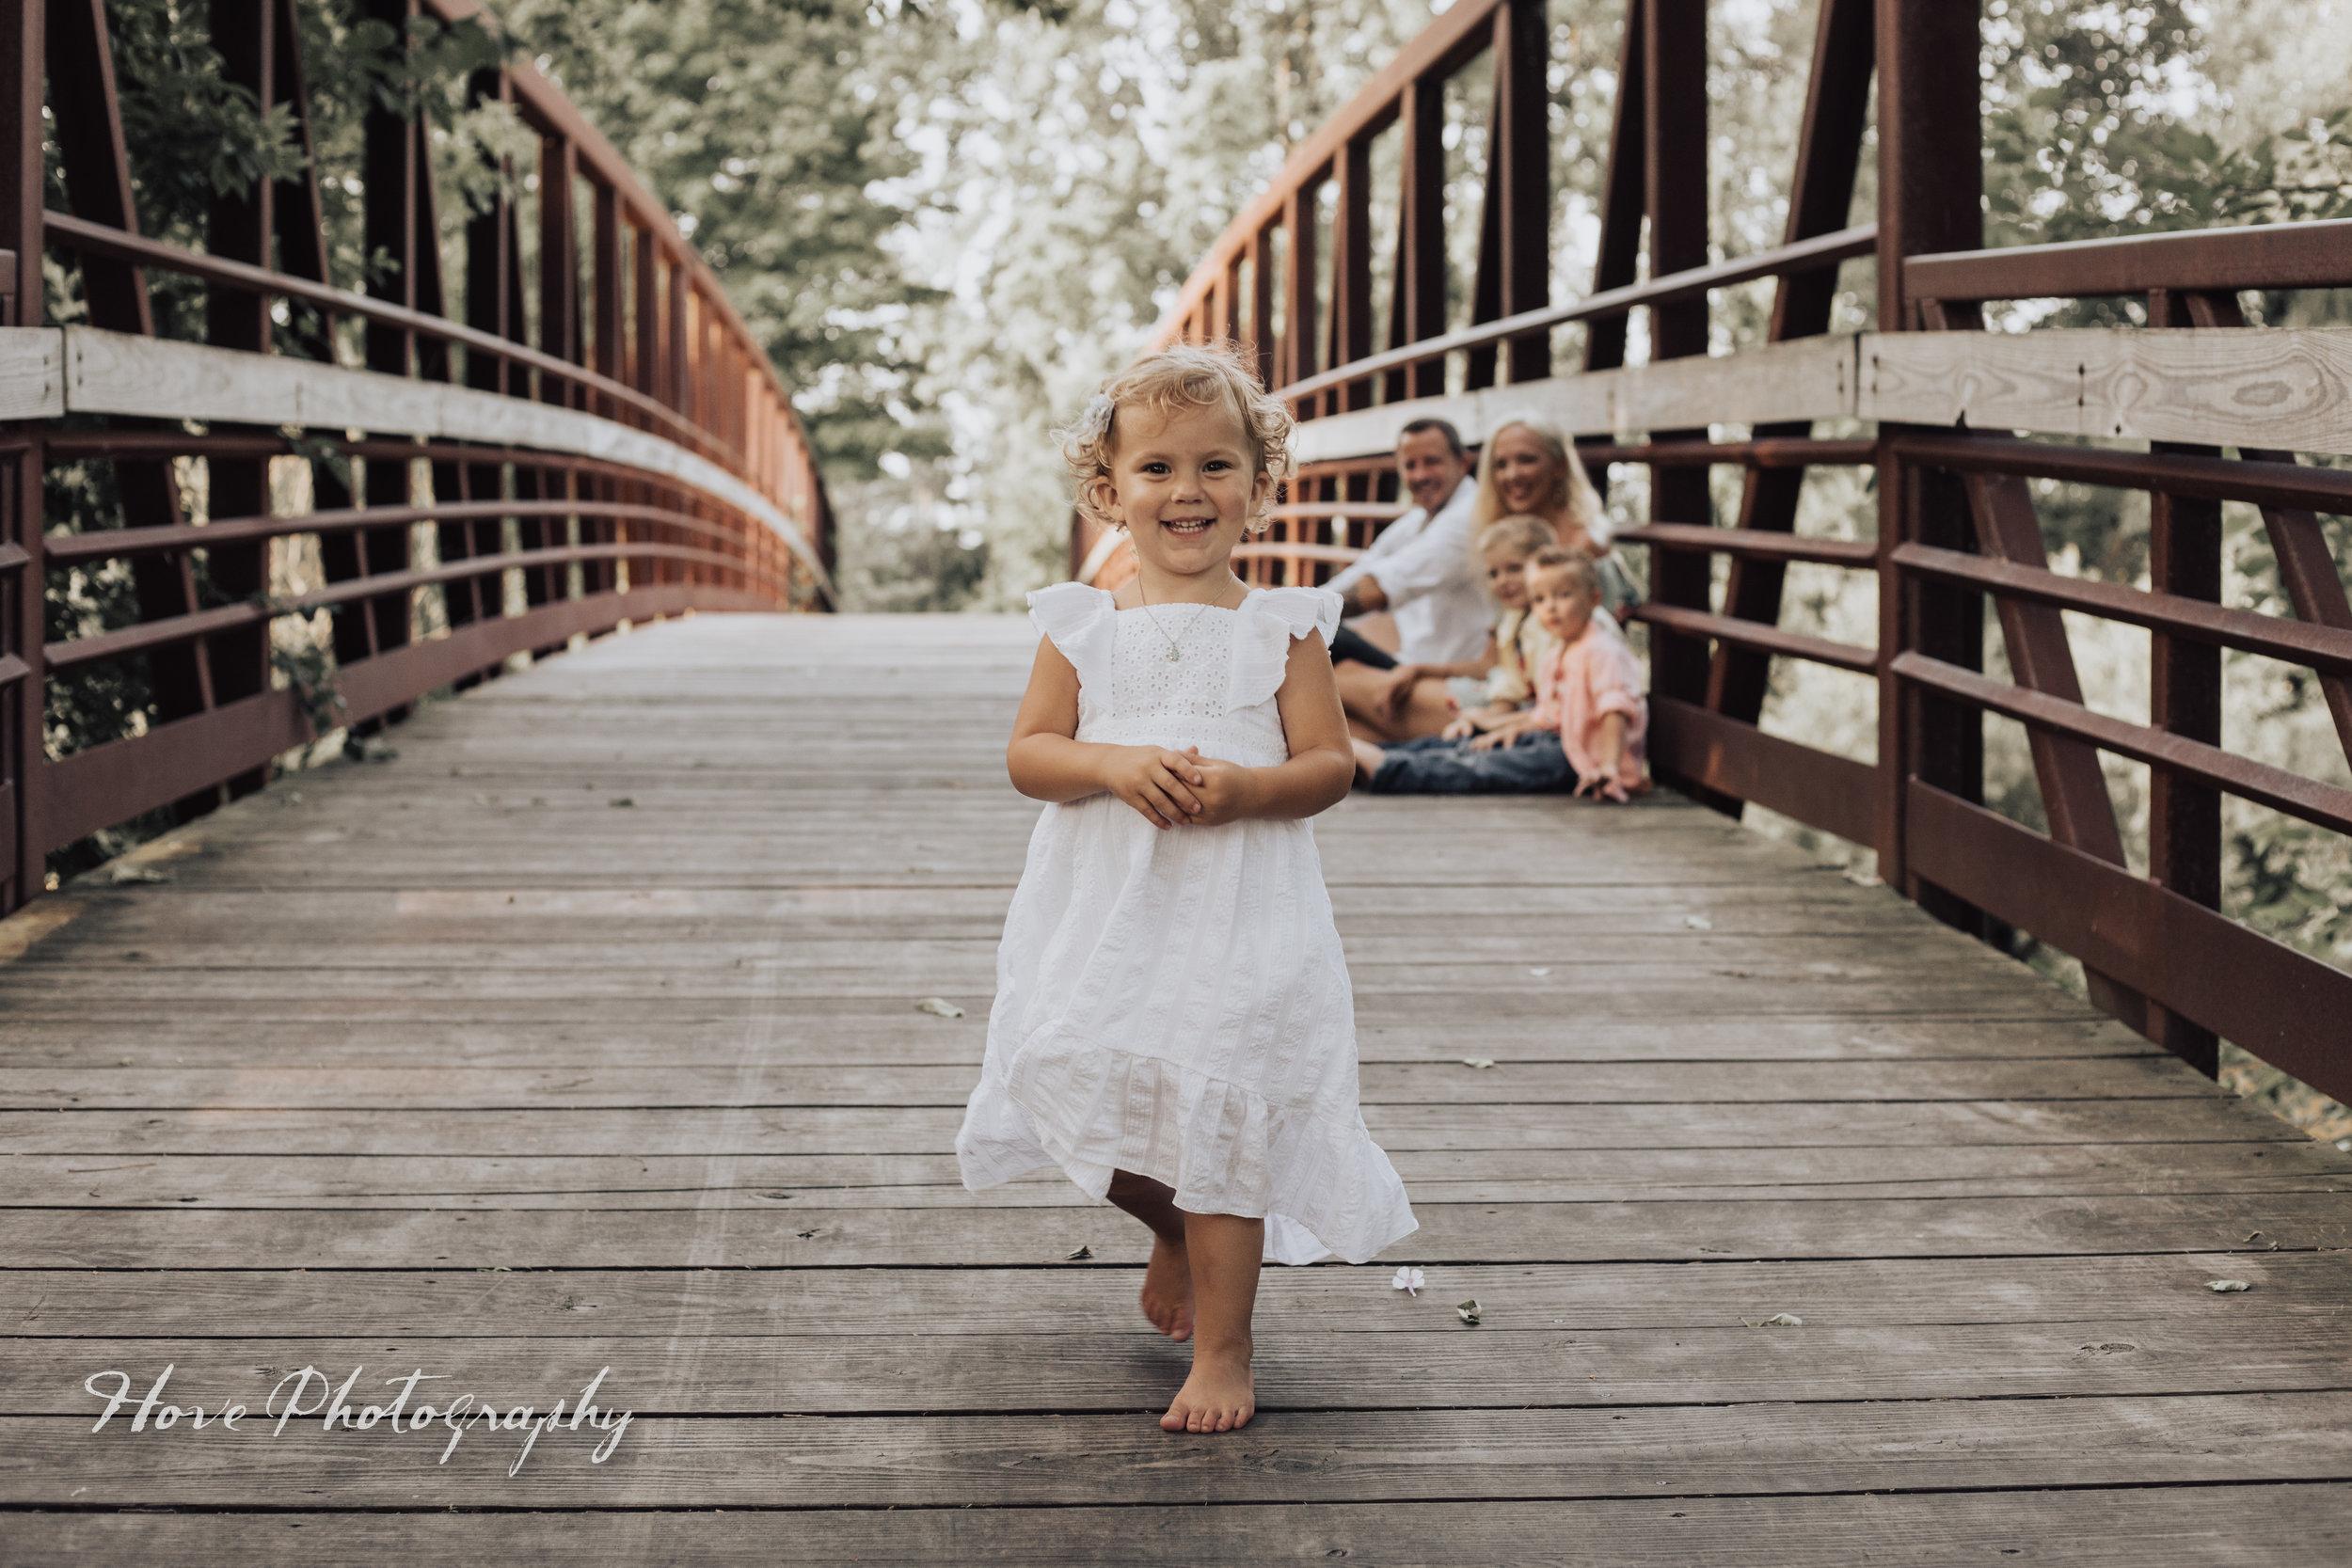 Green Isle Park: Family Photo Session